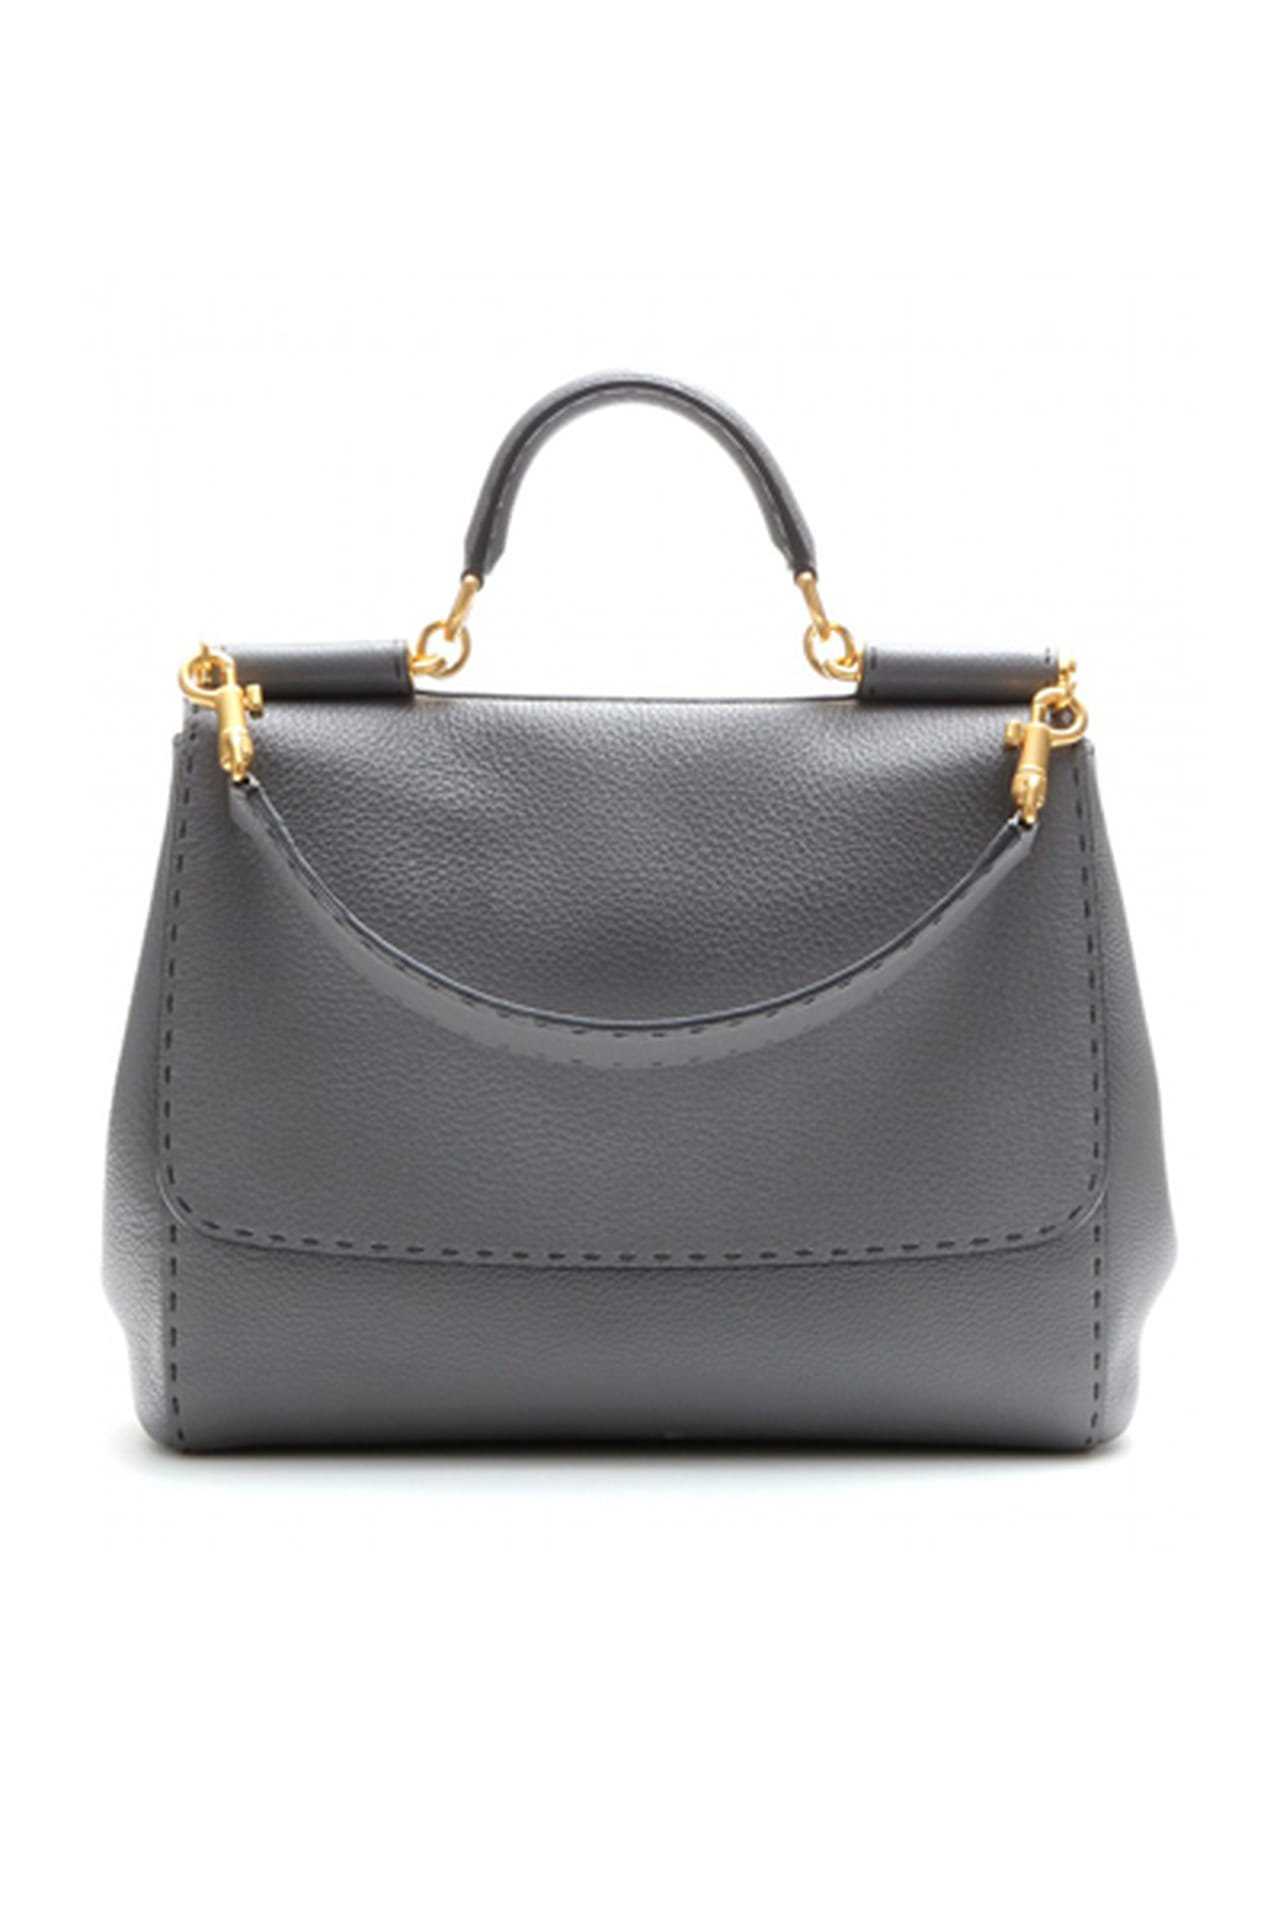 b548e77ff2357 الحقيبة الرمادية لتكملي إطلالاتك الرصينة في الخريف